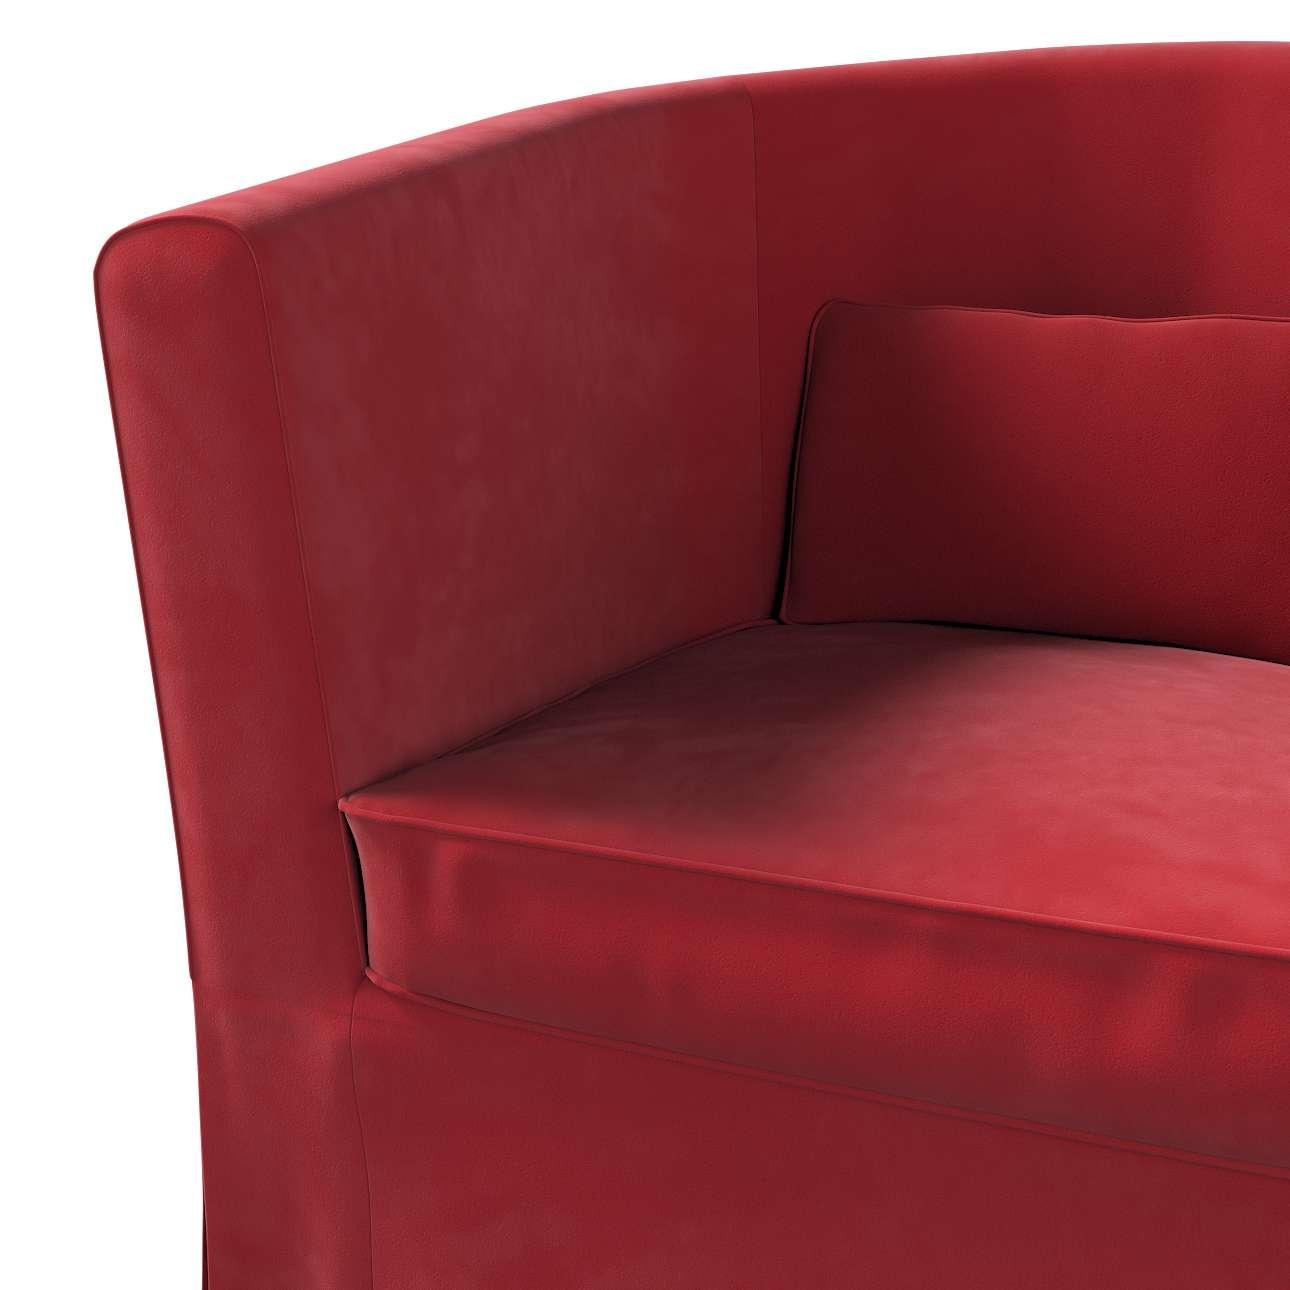 Pokrowiec na fotel Ektorp Tullsta w kolekcji Velvet, tkanina: 704-15